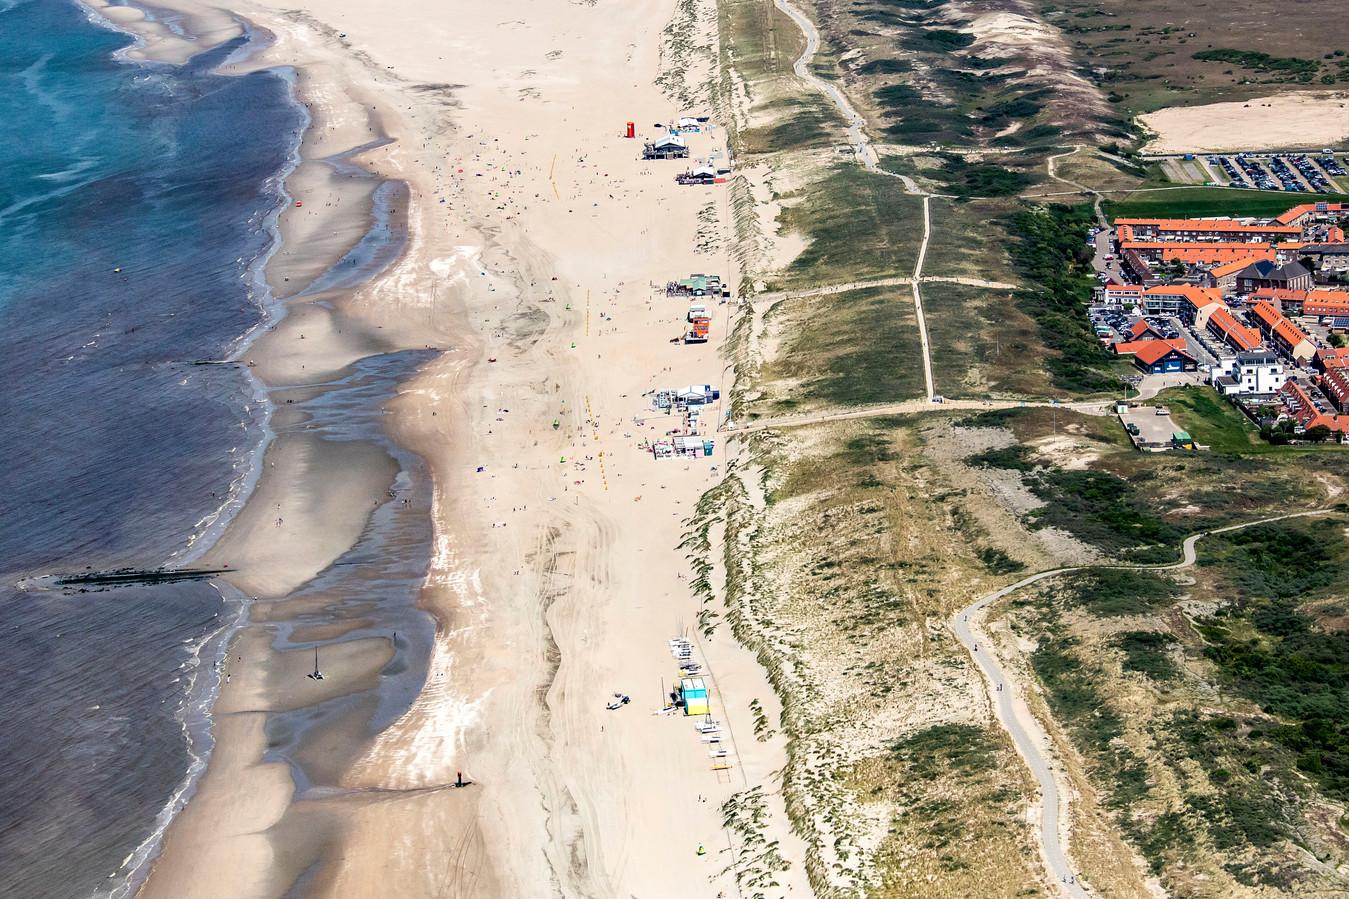 Strandpaviljoens langs de Westlandse kust